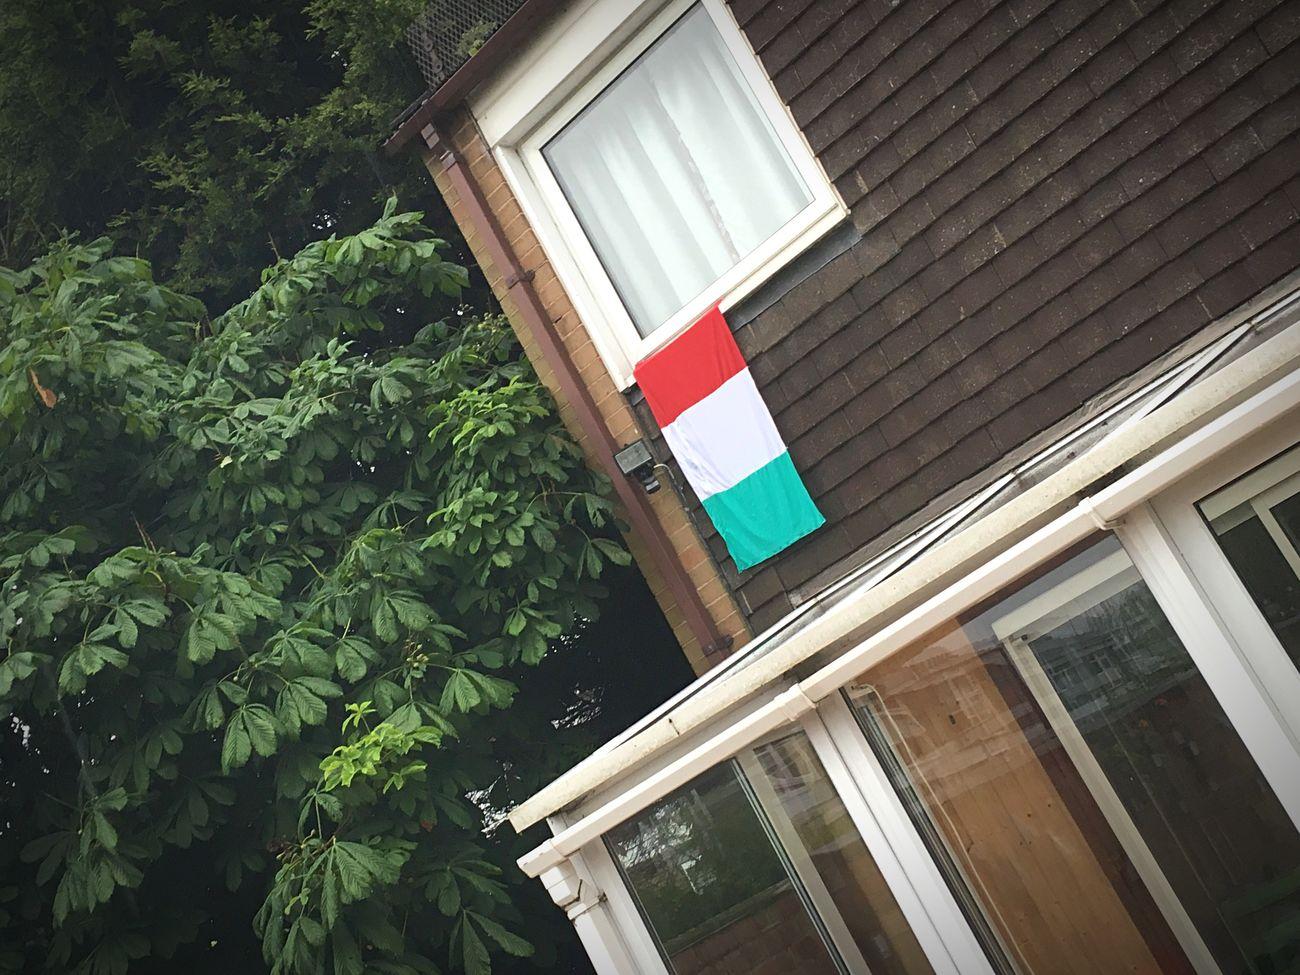 Hungary Hungarian Flag Magyarország Euro2016 Magic Hun Football Foci Büszkeség Proud Győzelem Win Red White Green